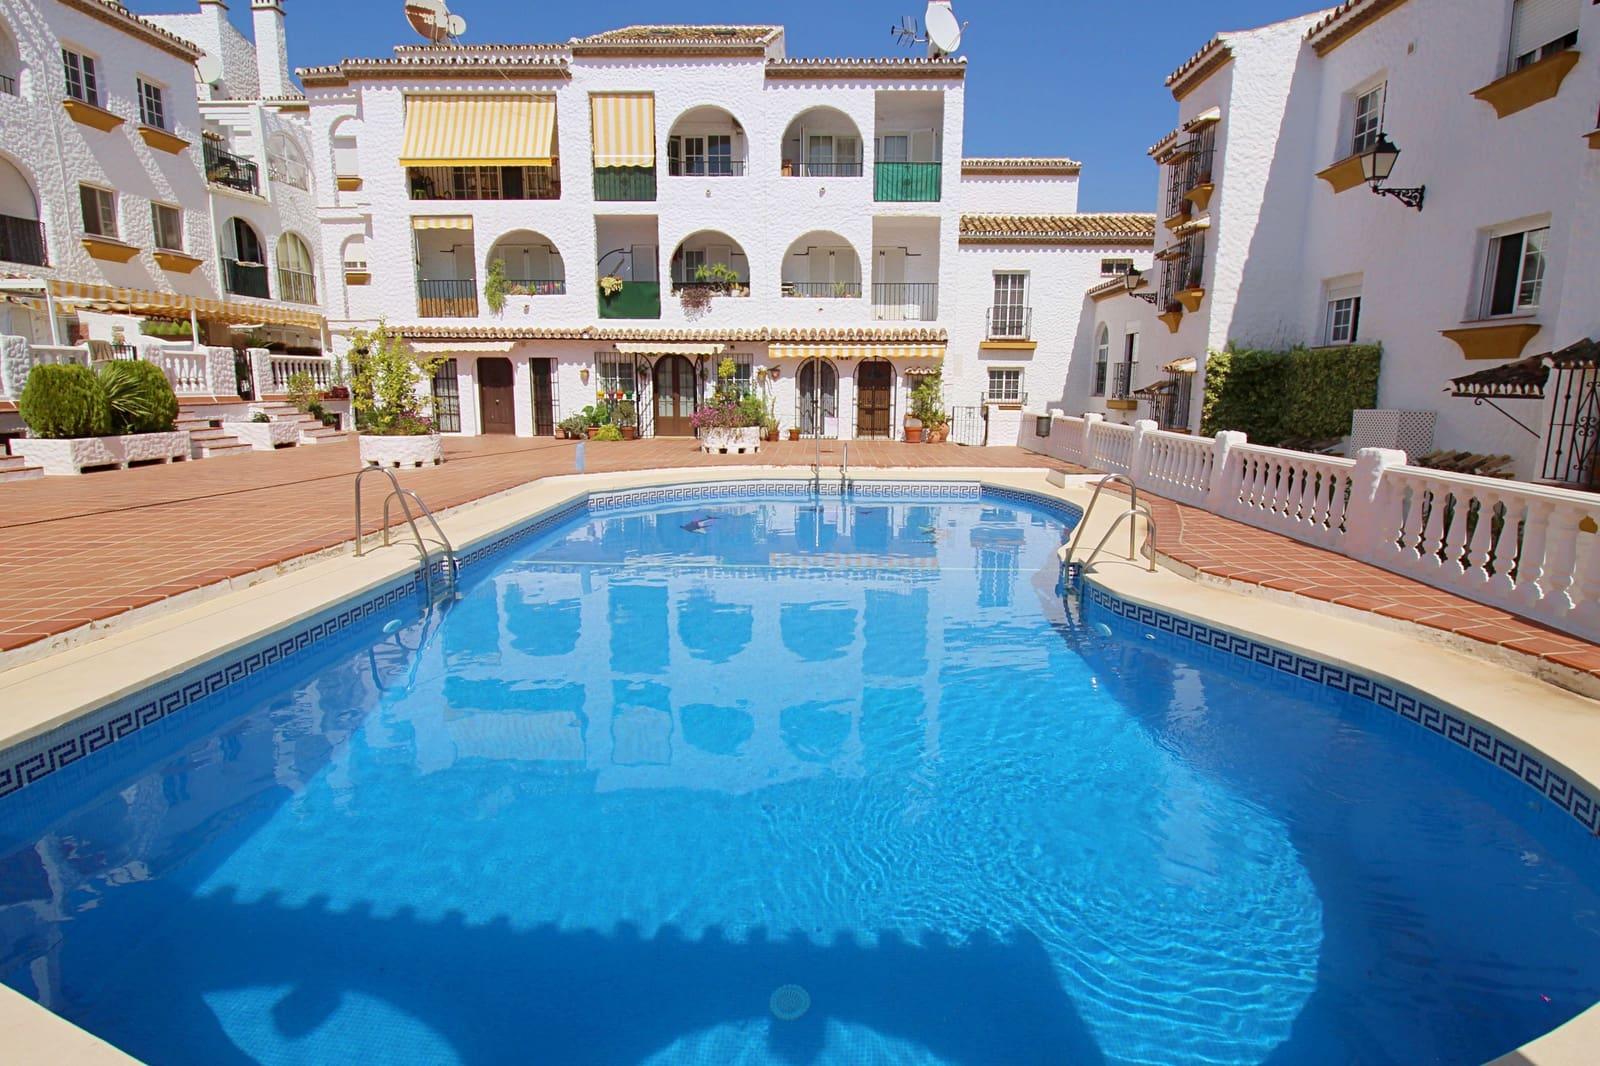 2 bedroom Townhouse for sale in Benalmadena - € 265,000 (Ref: 6328590)